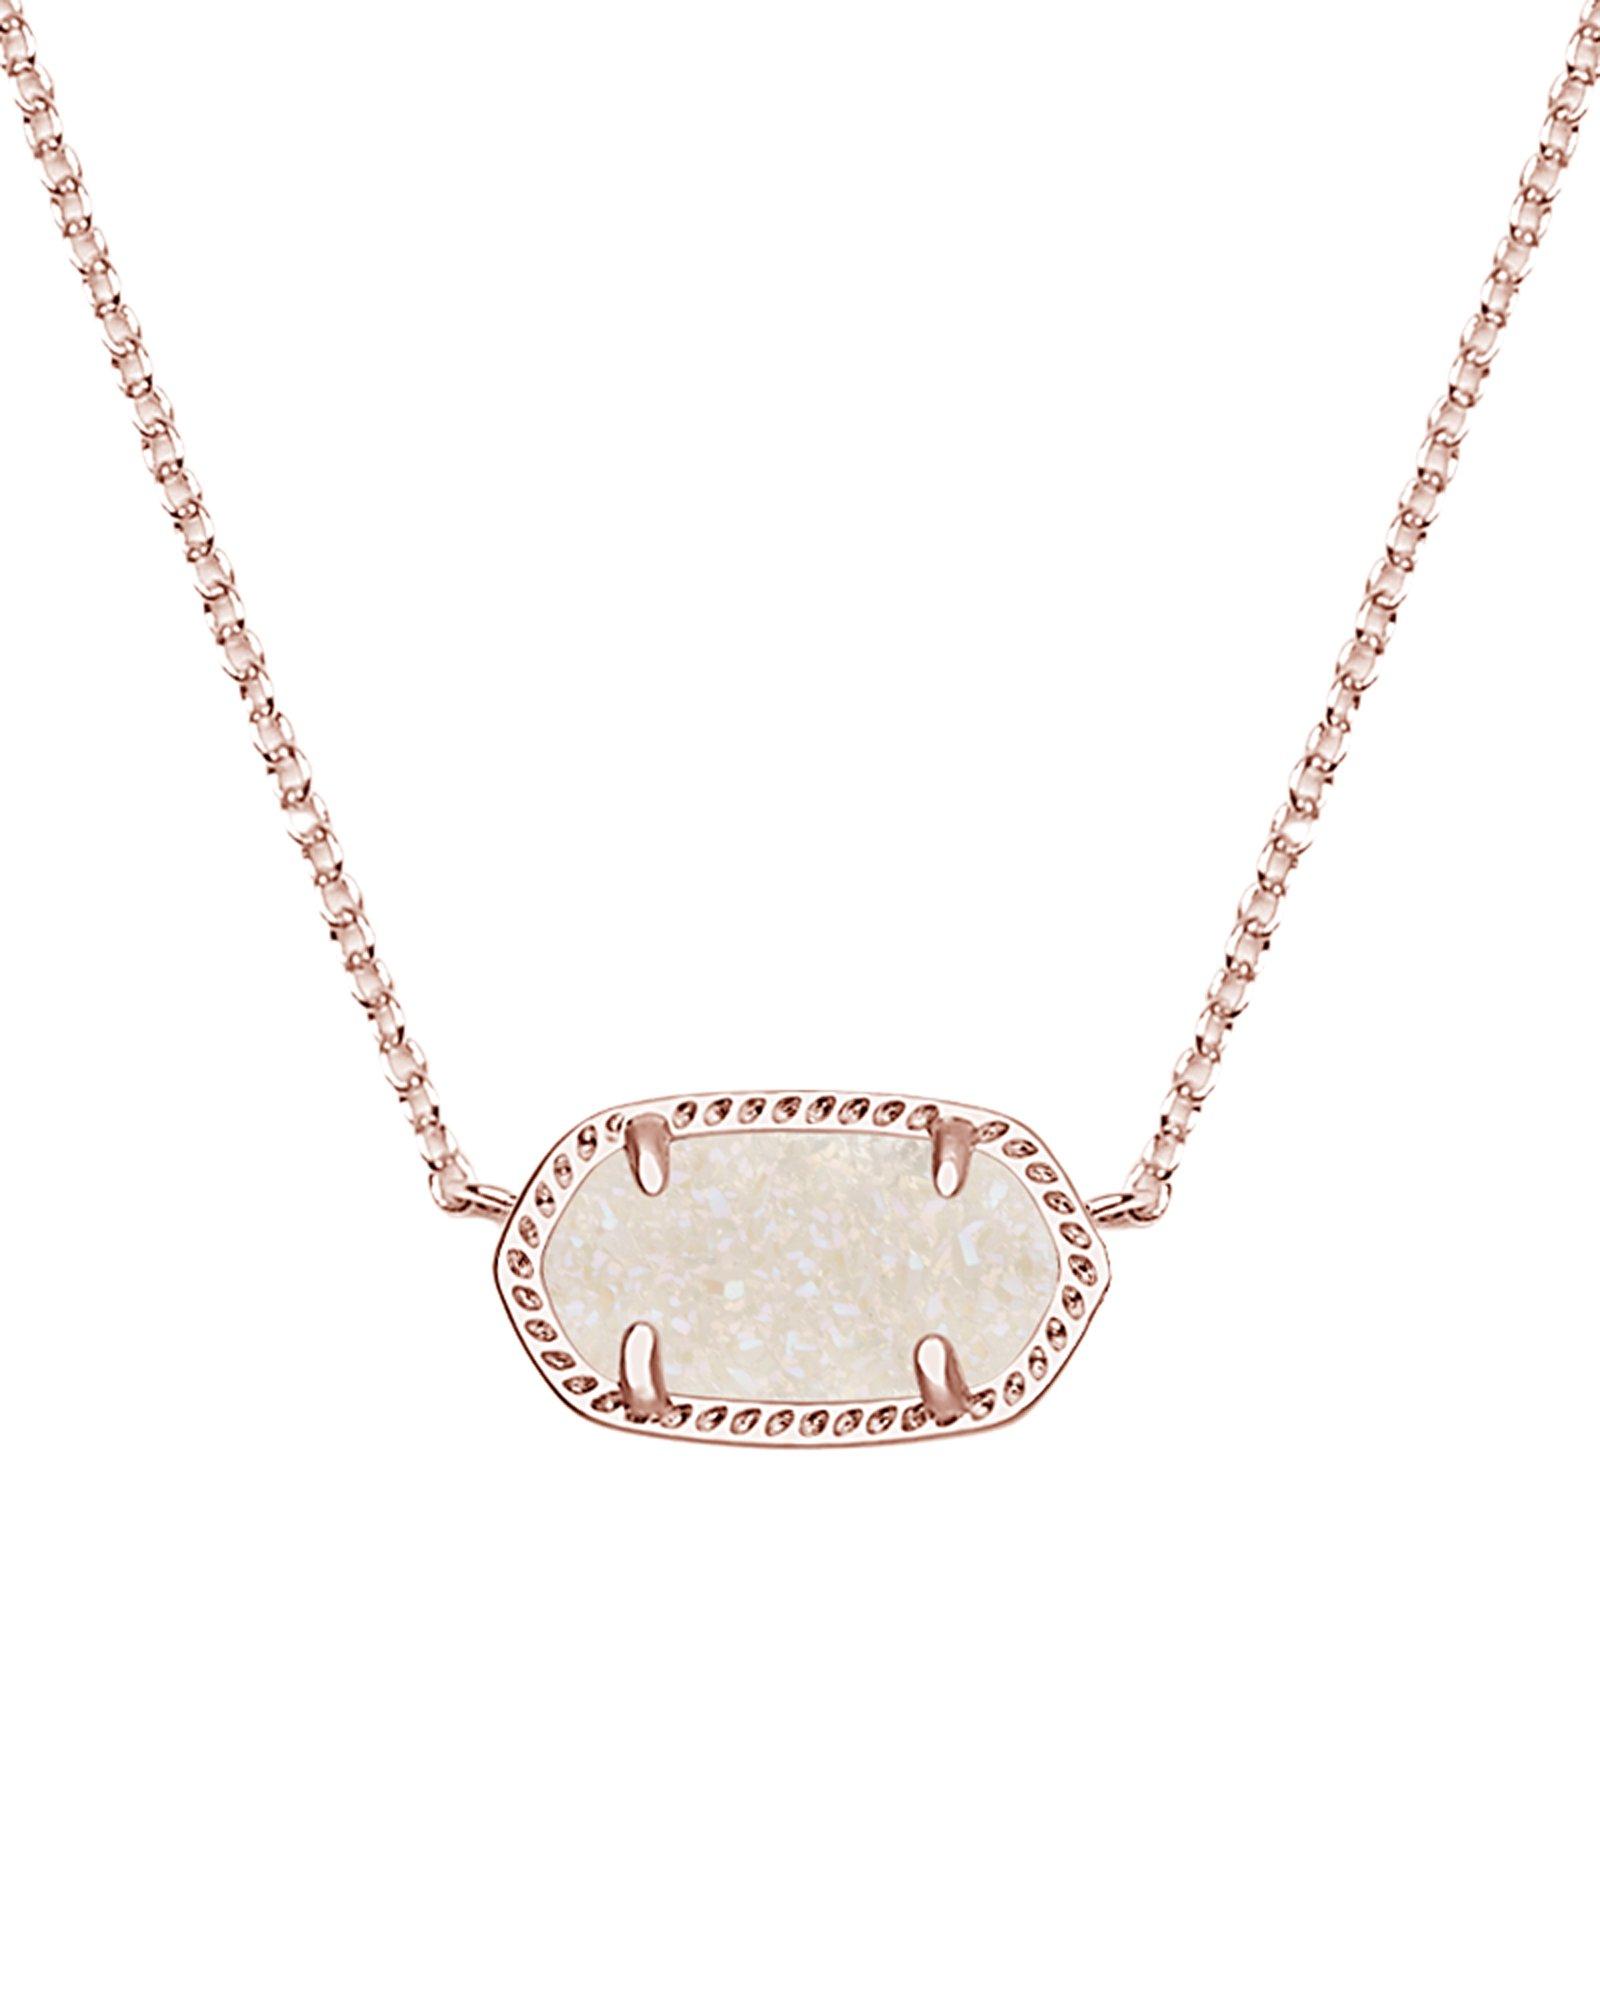 Kendra Scott Women's Elisa Pendant Necklace Rose Gold/Iridescent Drusy Necklace